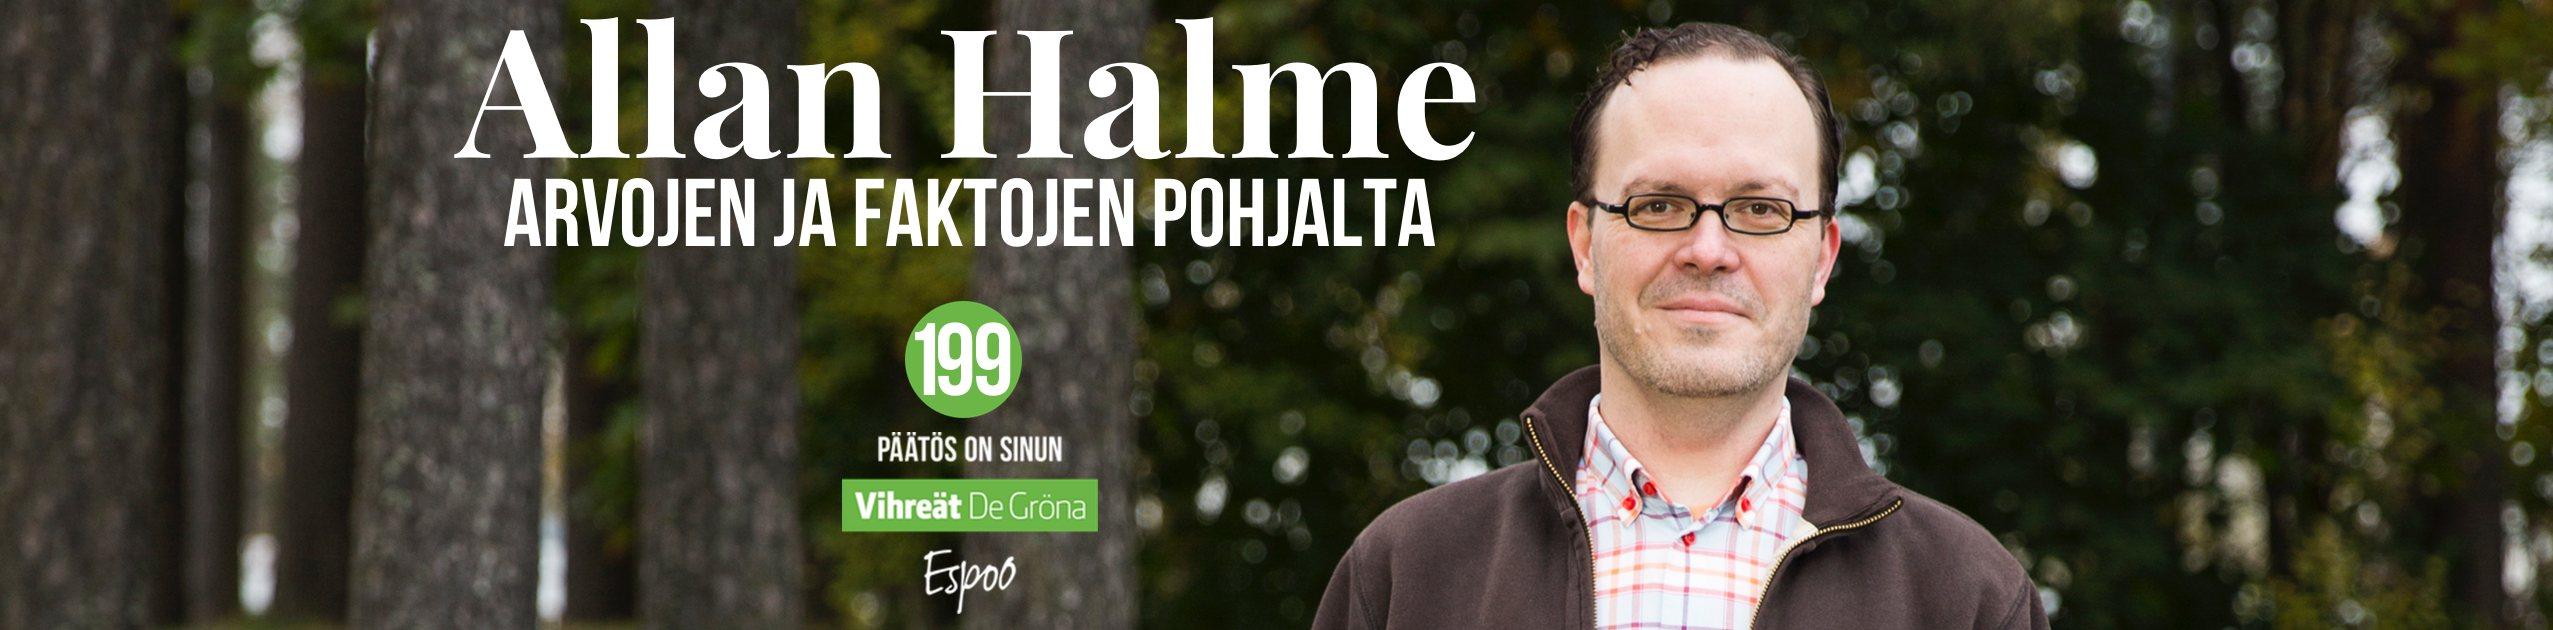 Allan Halme